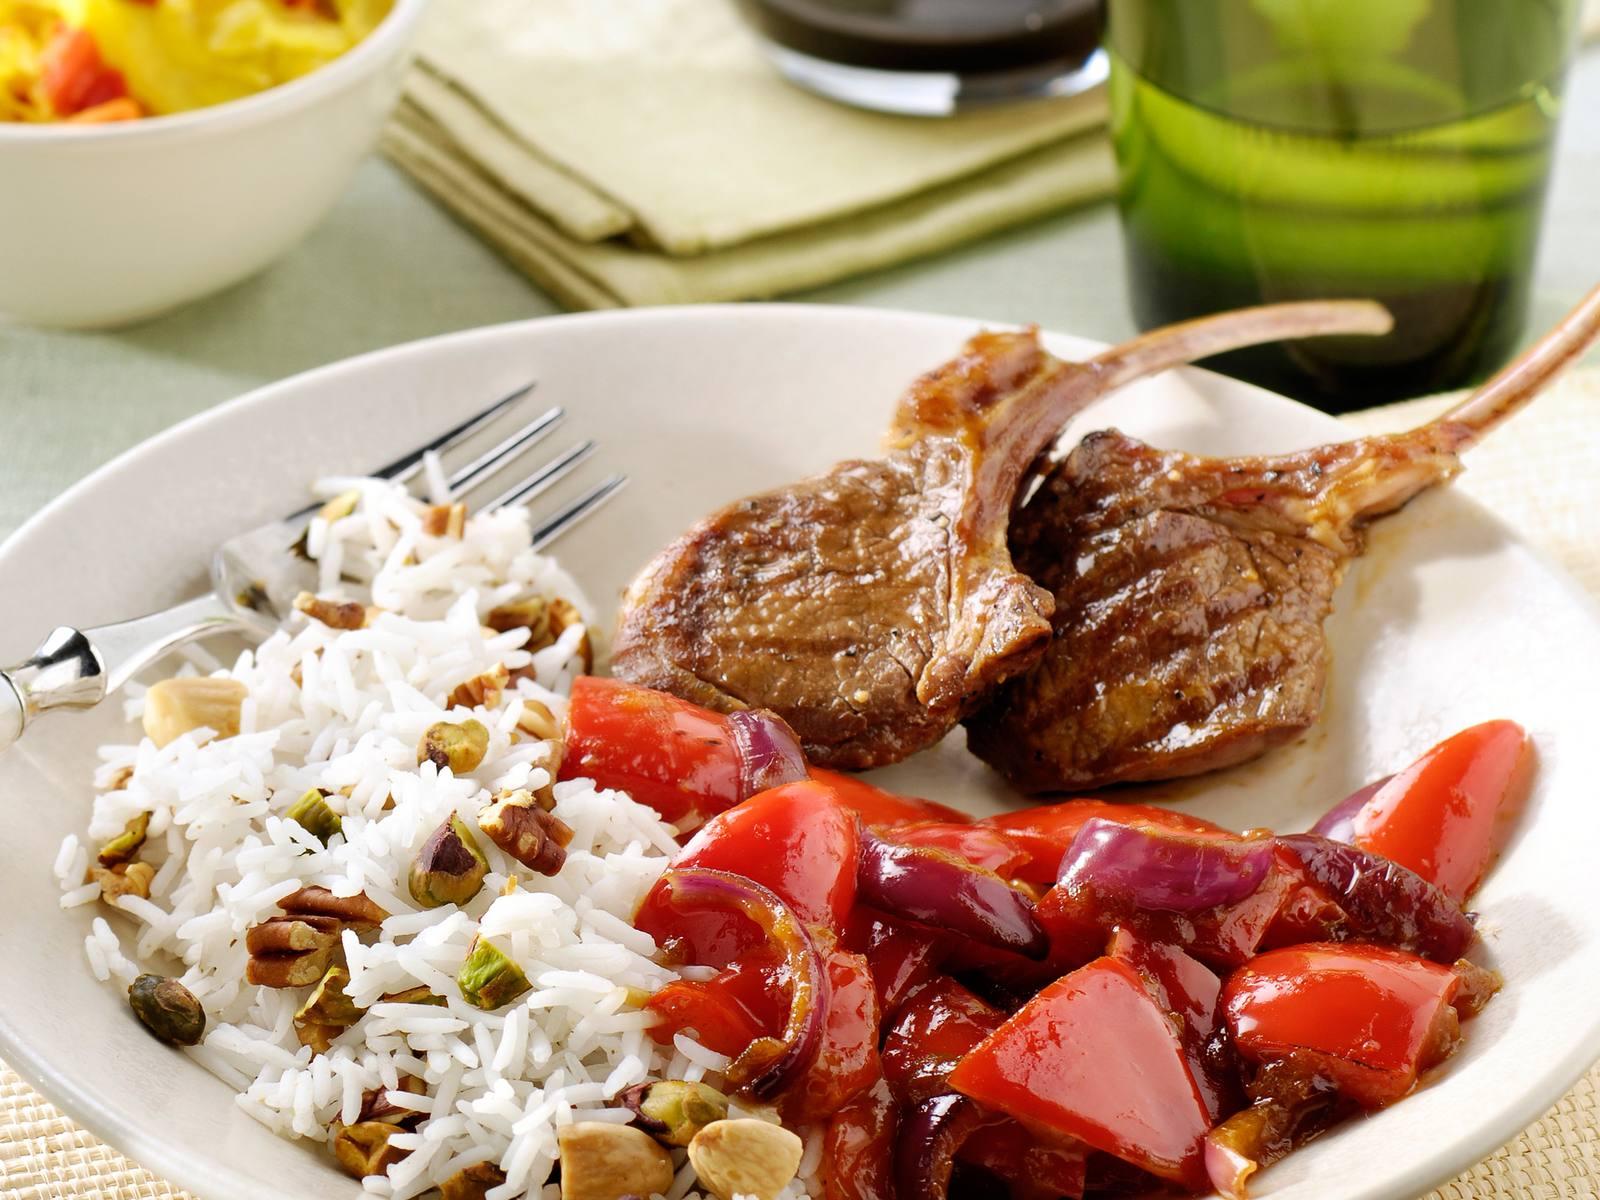 Sajoer boontjes met paprika, gegrilde lamskoteletjes en notenrijst